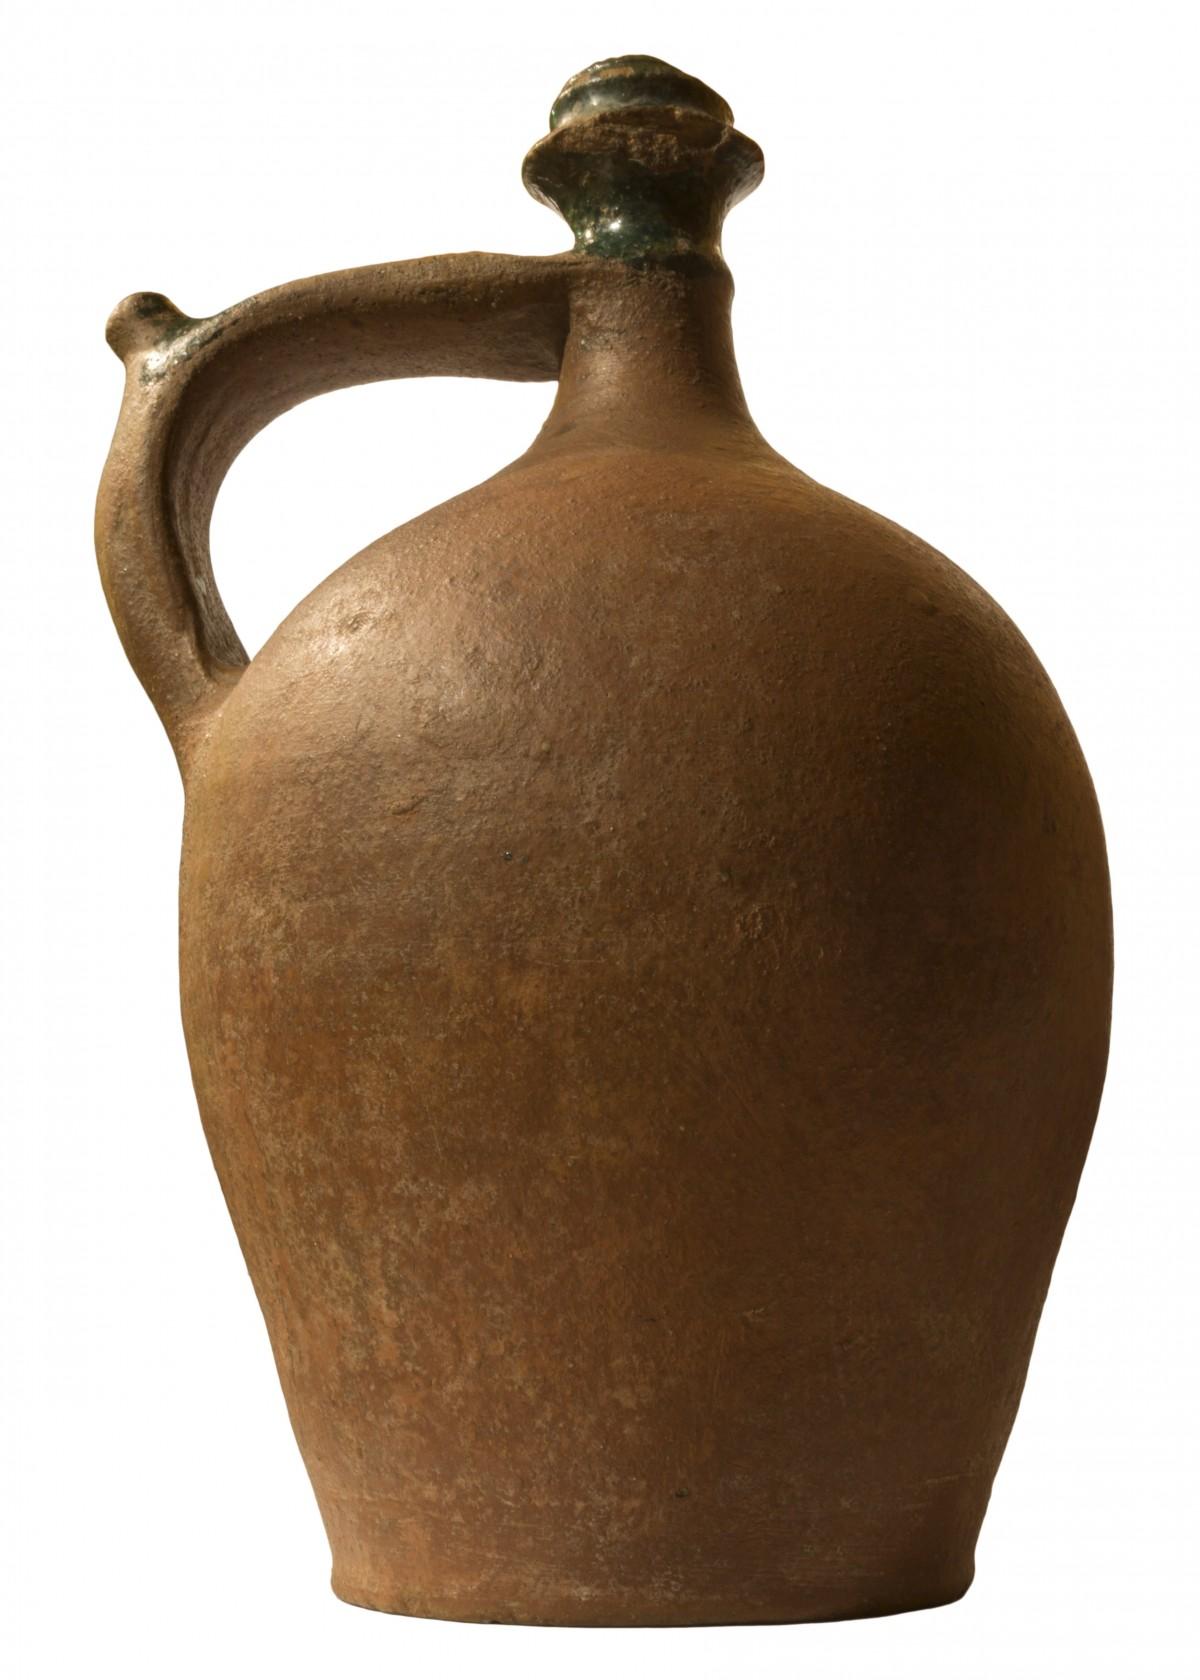 Free Images Glass Teapot Cup Vase Decoration